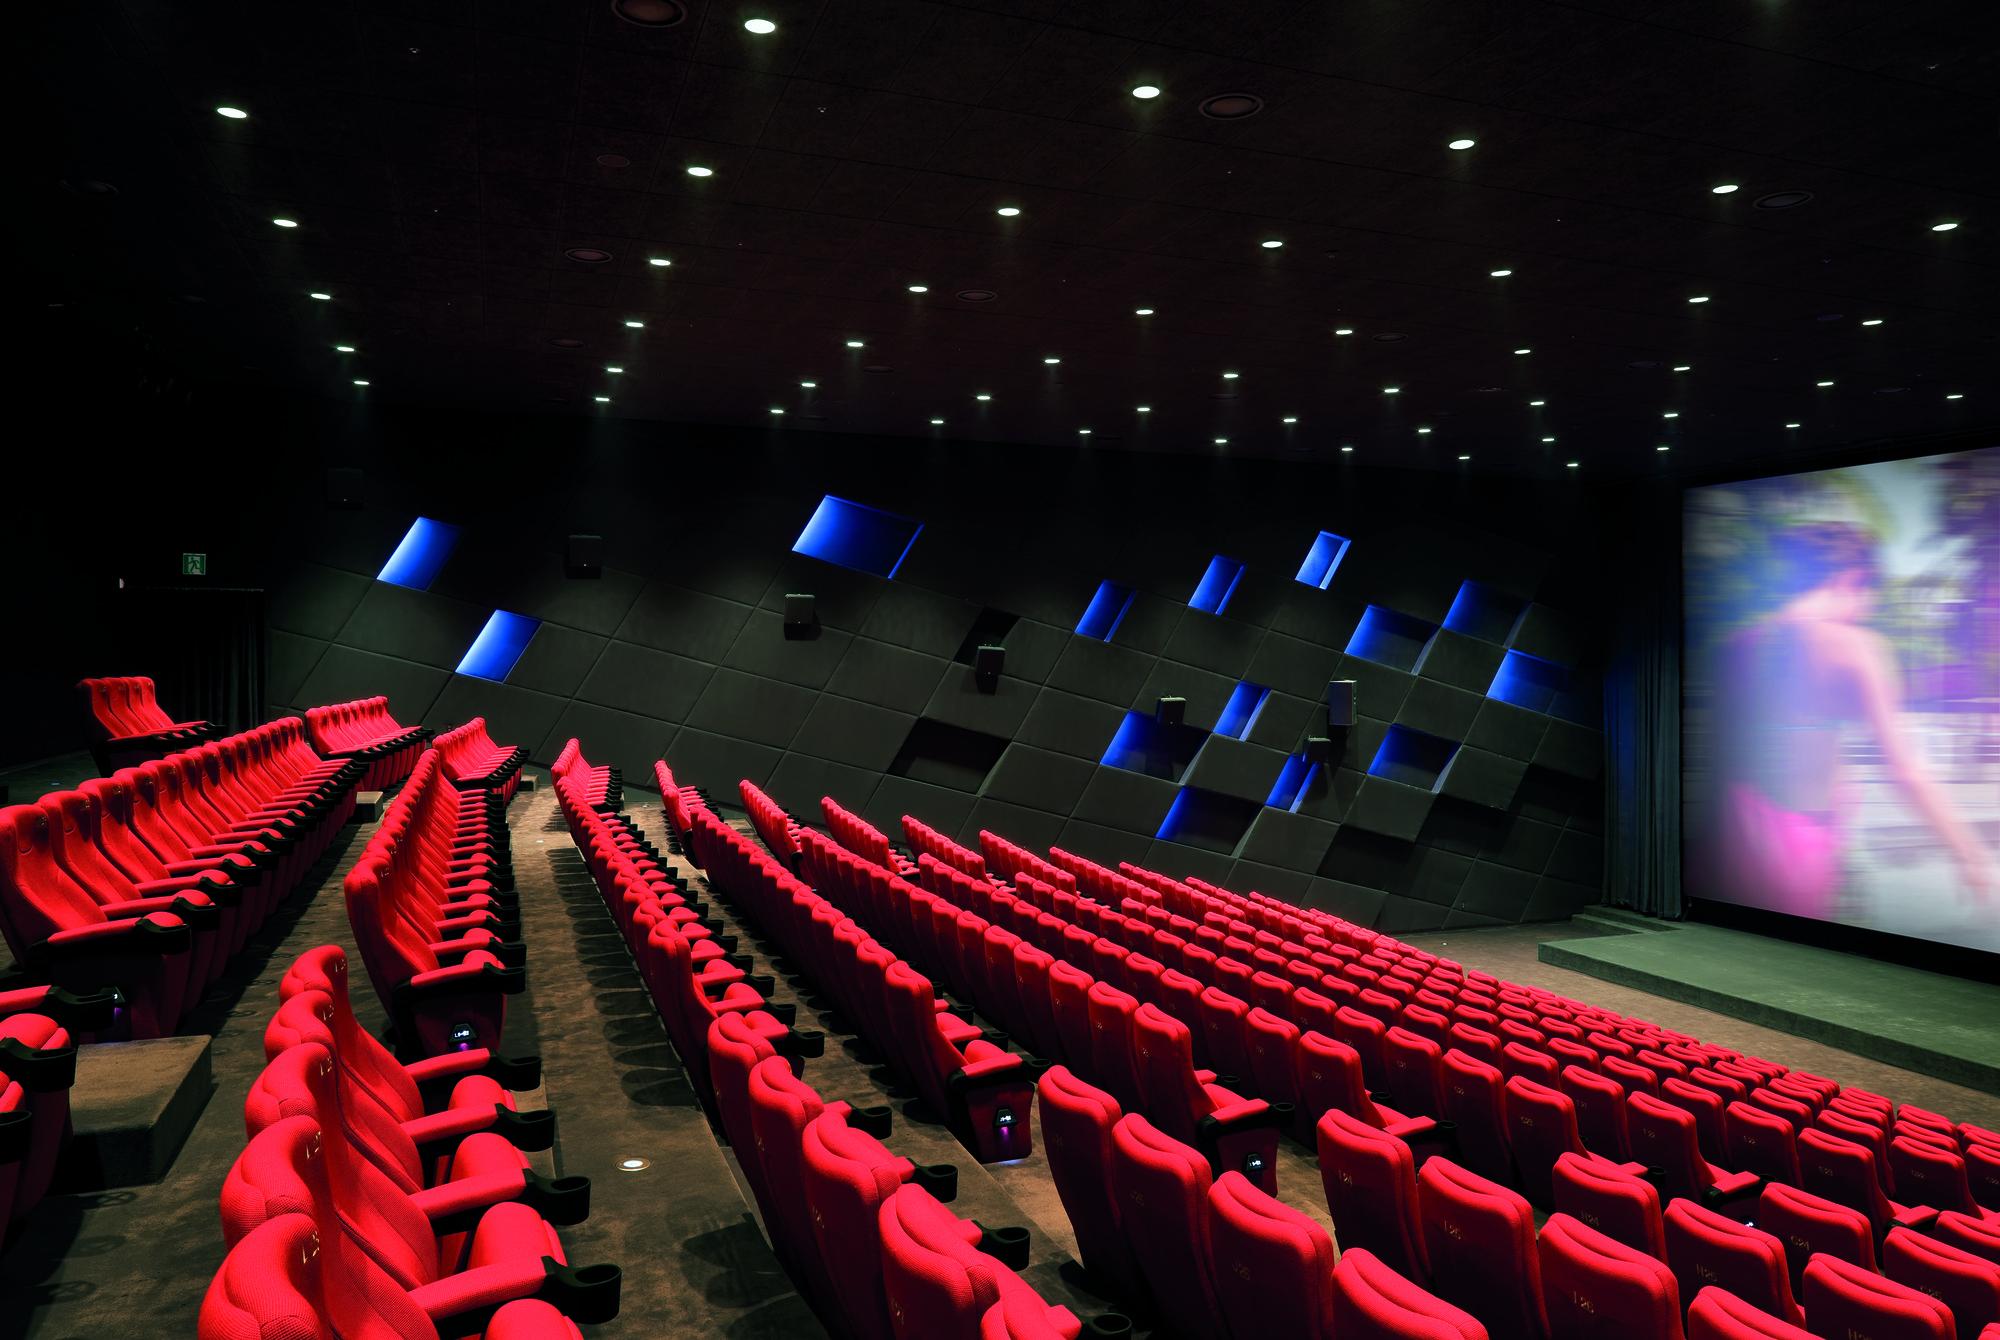 Cinema Center gallery of busan cinema center coop himmelb l au 20